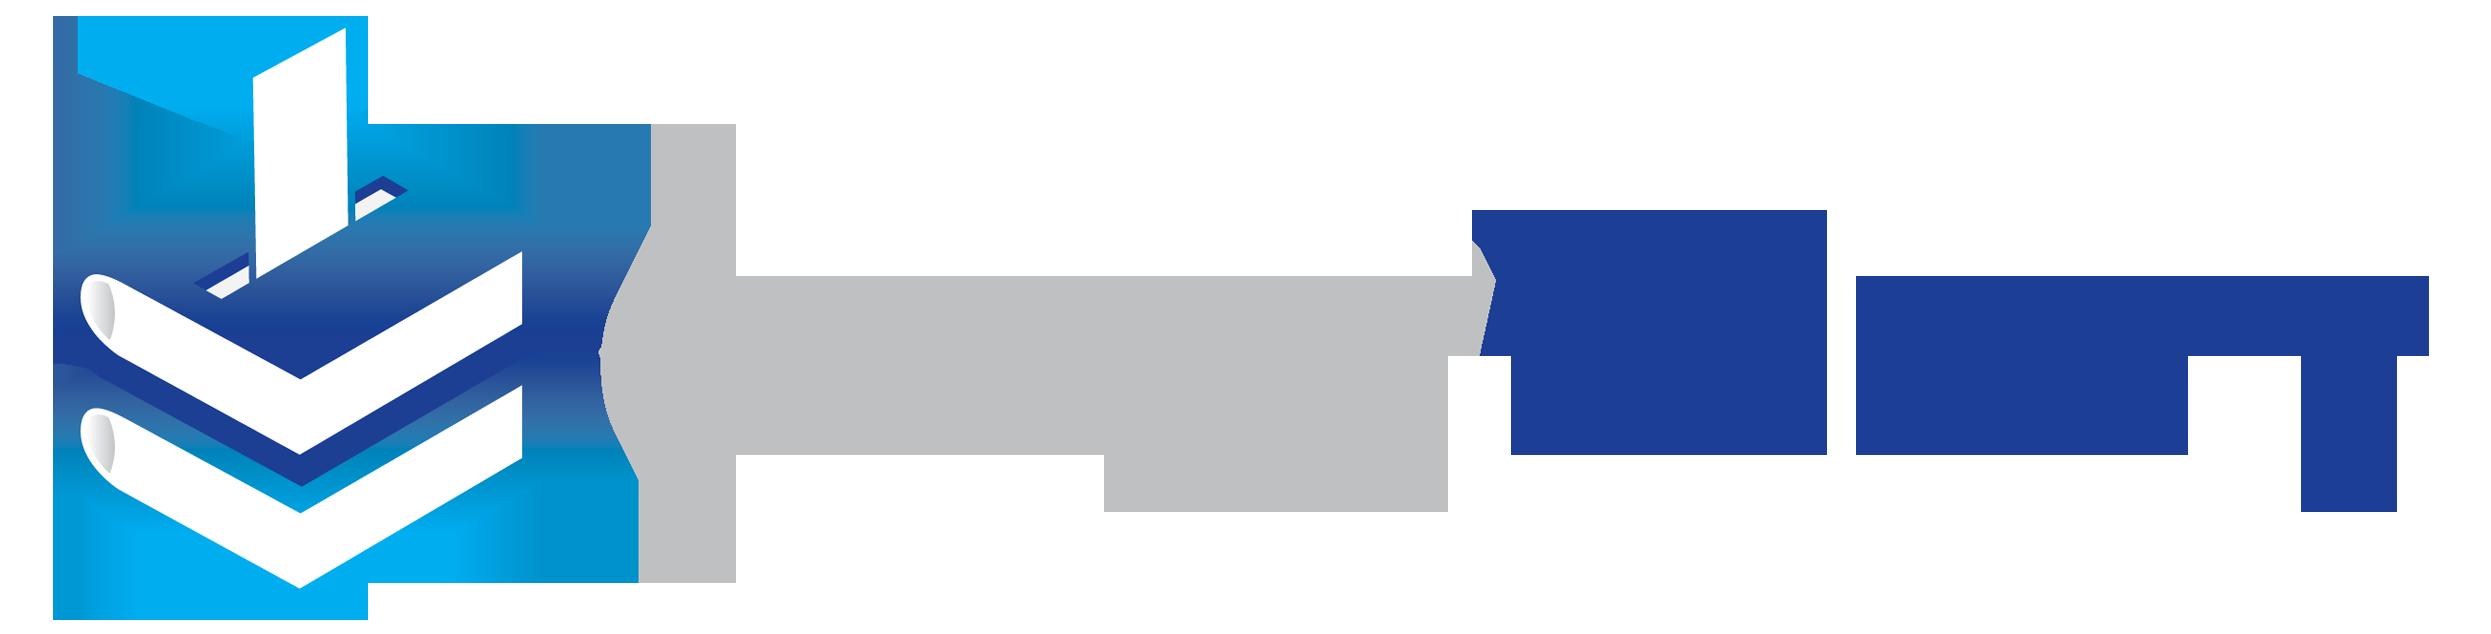 everylibrary logo